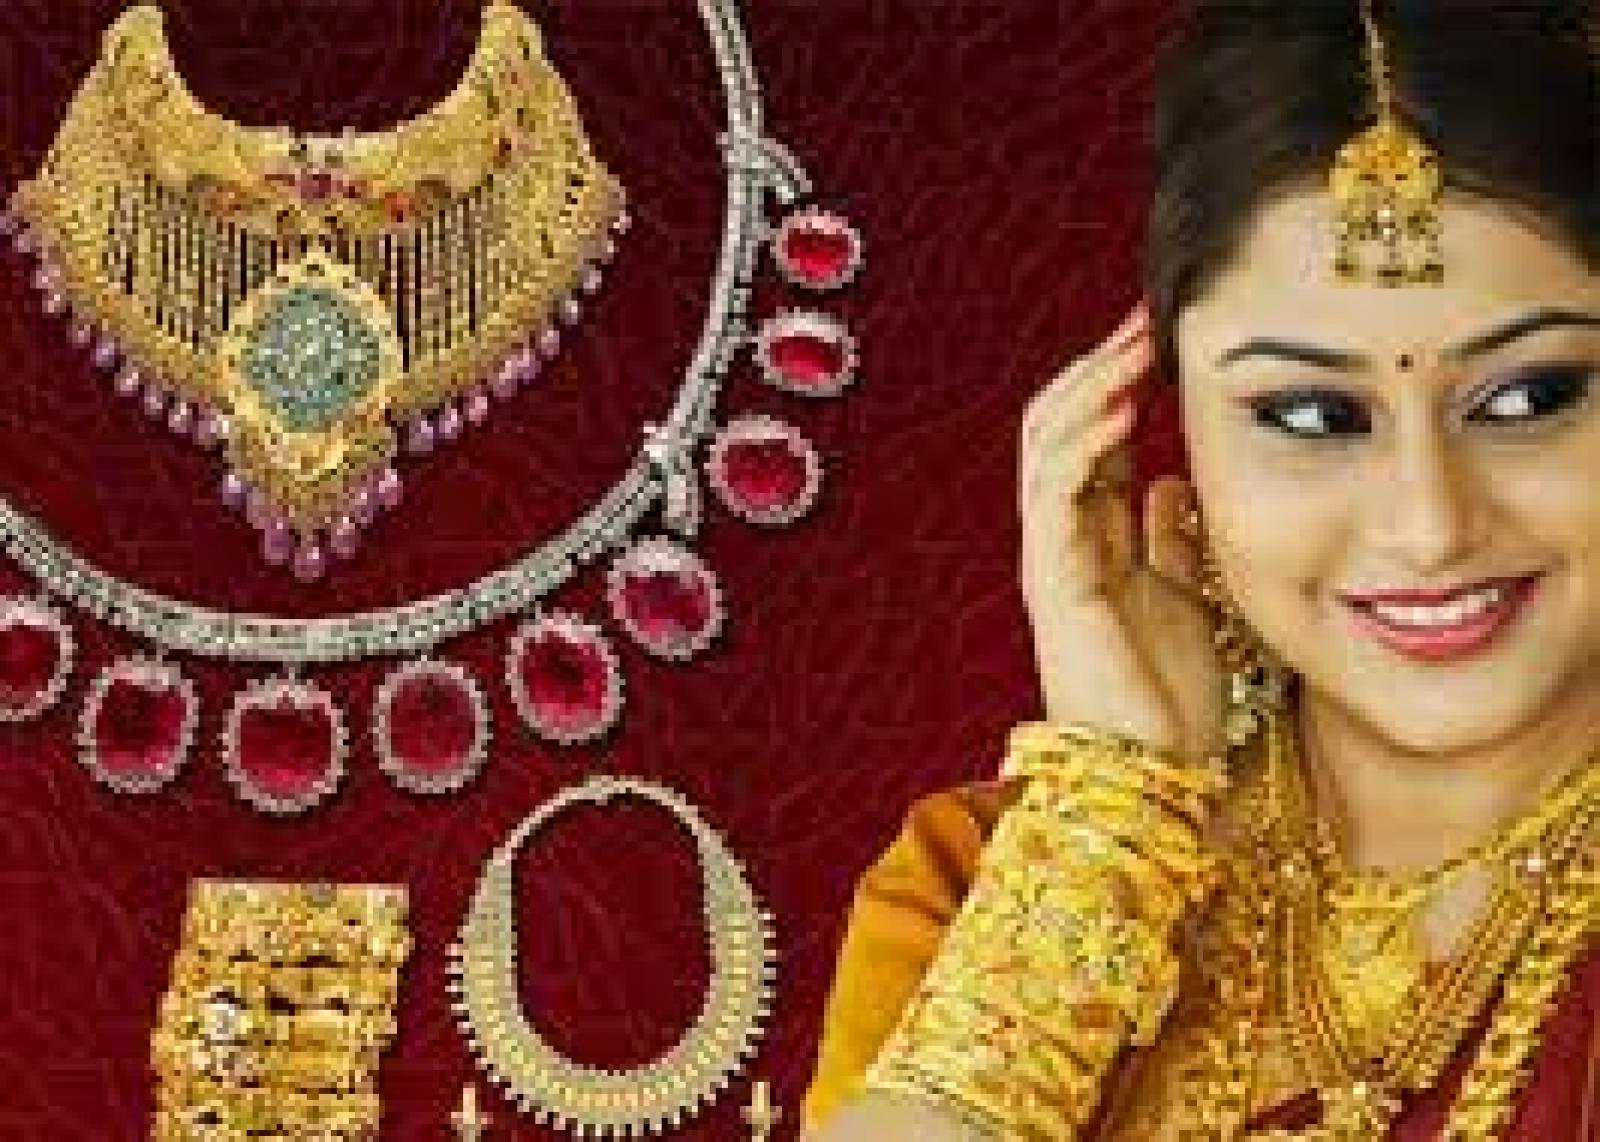 Anopchand Tilokchand Jewellers